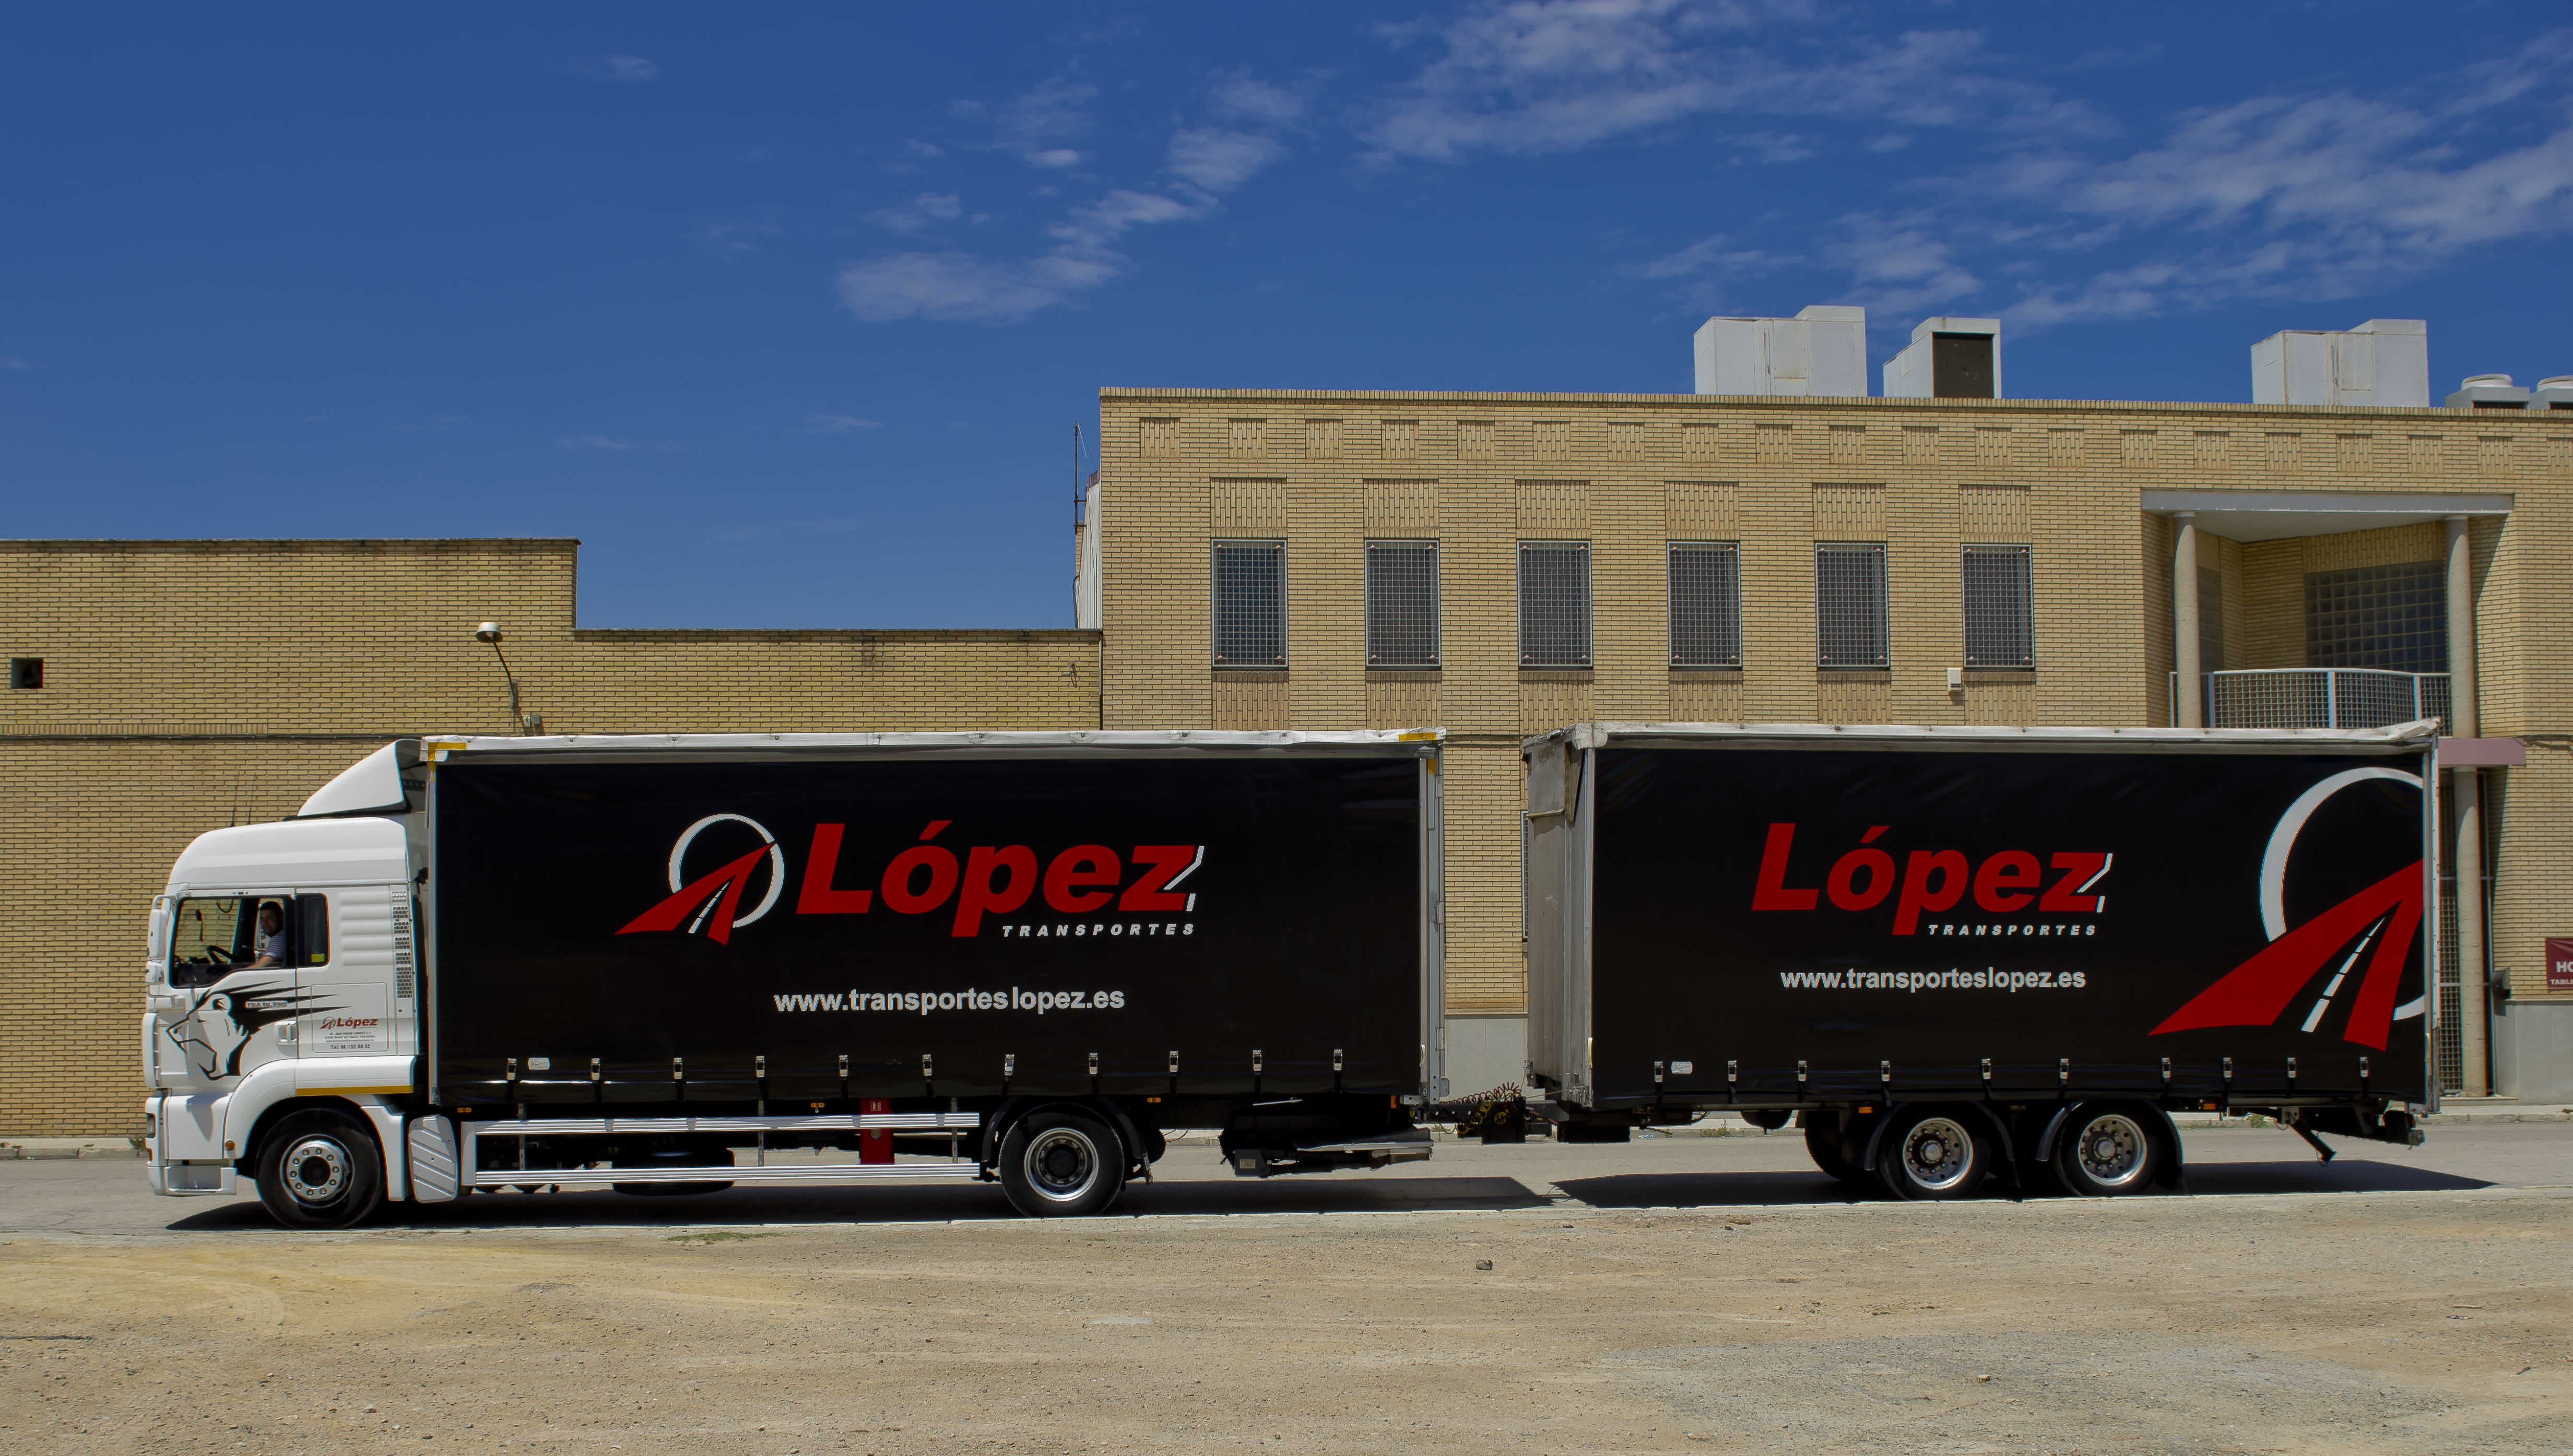 Foto 15 de Transportes de mercancía por grupaje o cargas completas en  46950 Xirivella | Transportes López